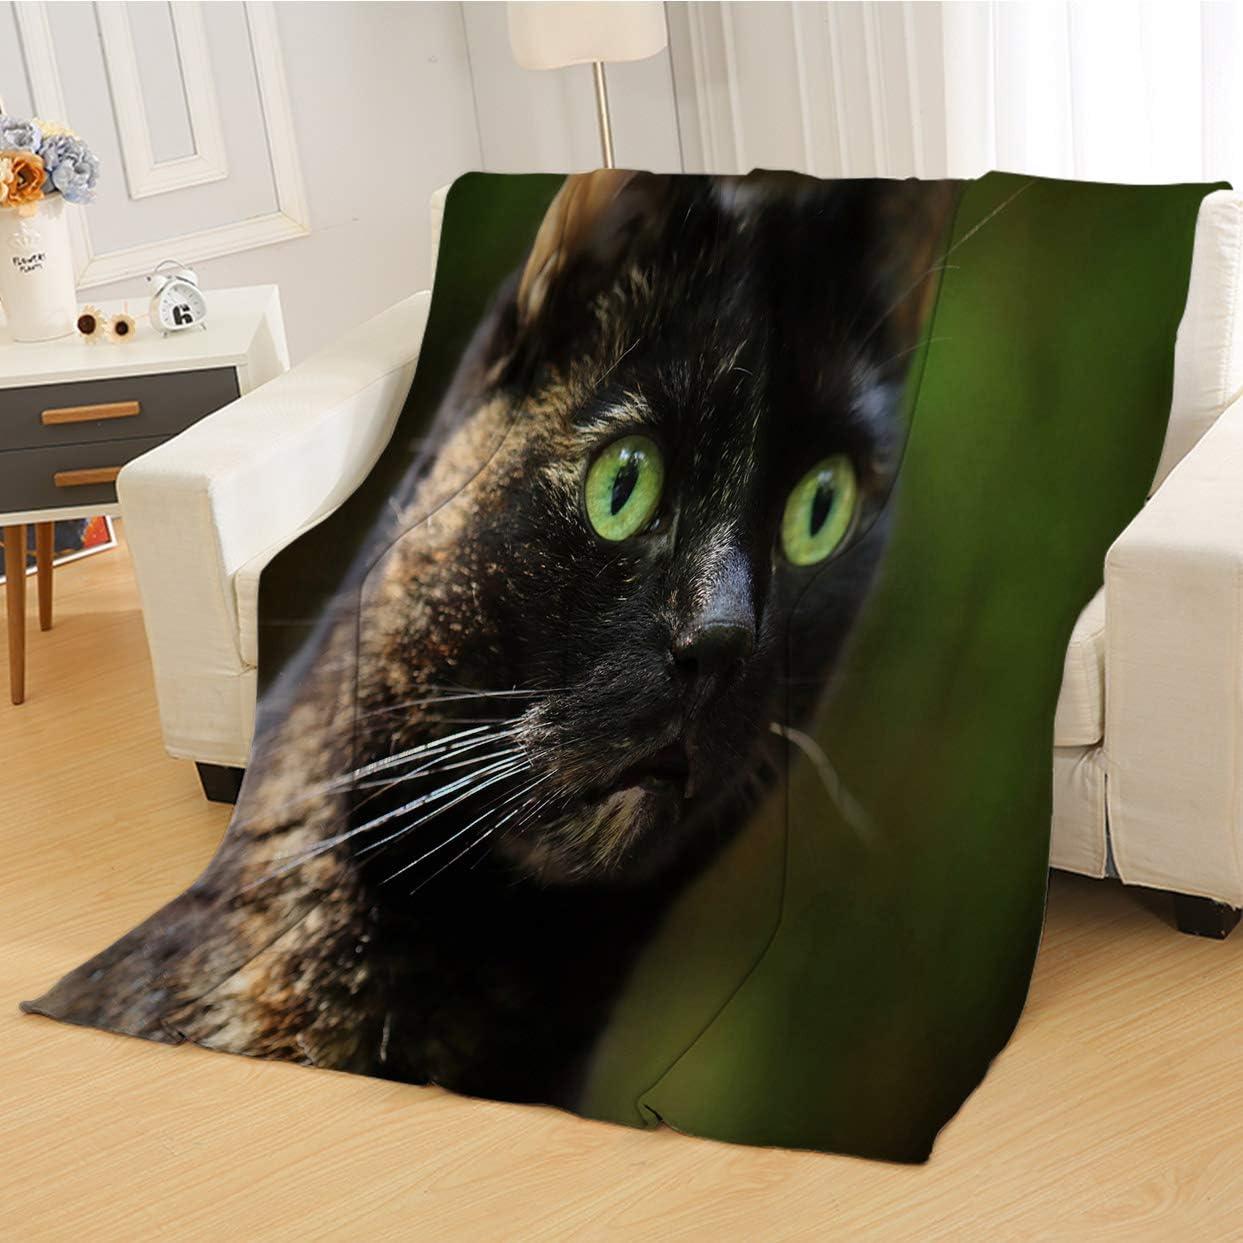 RLDSESS Cat Soft Baby Bed Blanket Season Max 58% OFF Fa All Sale item